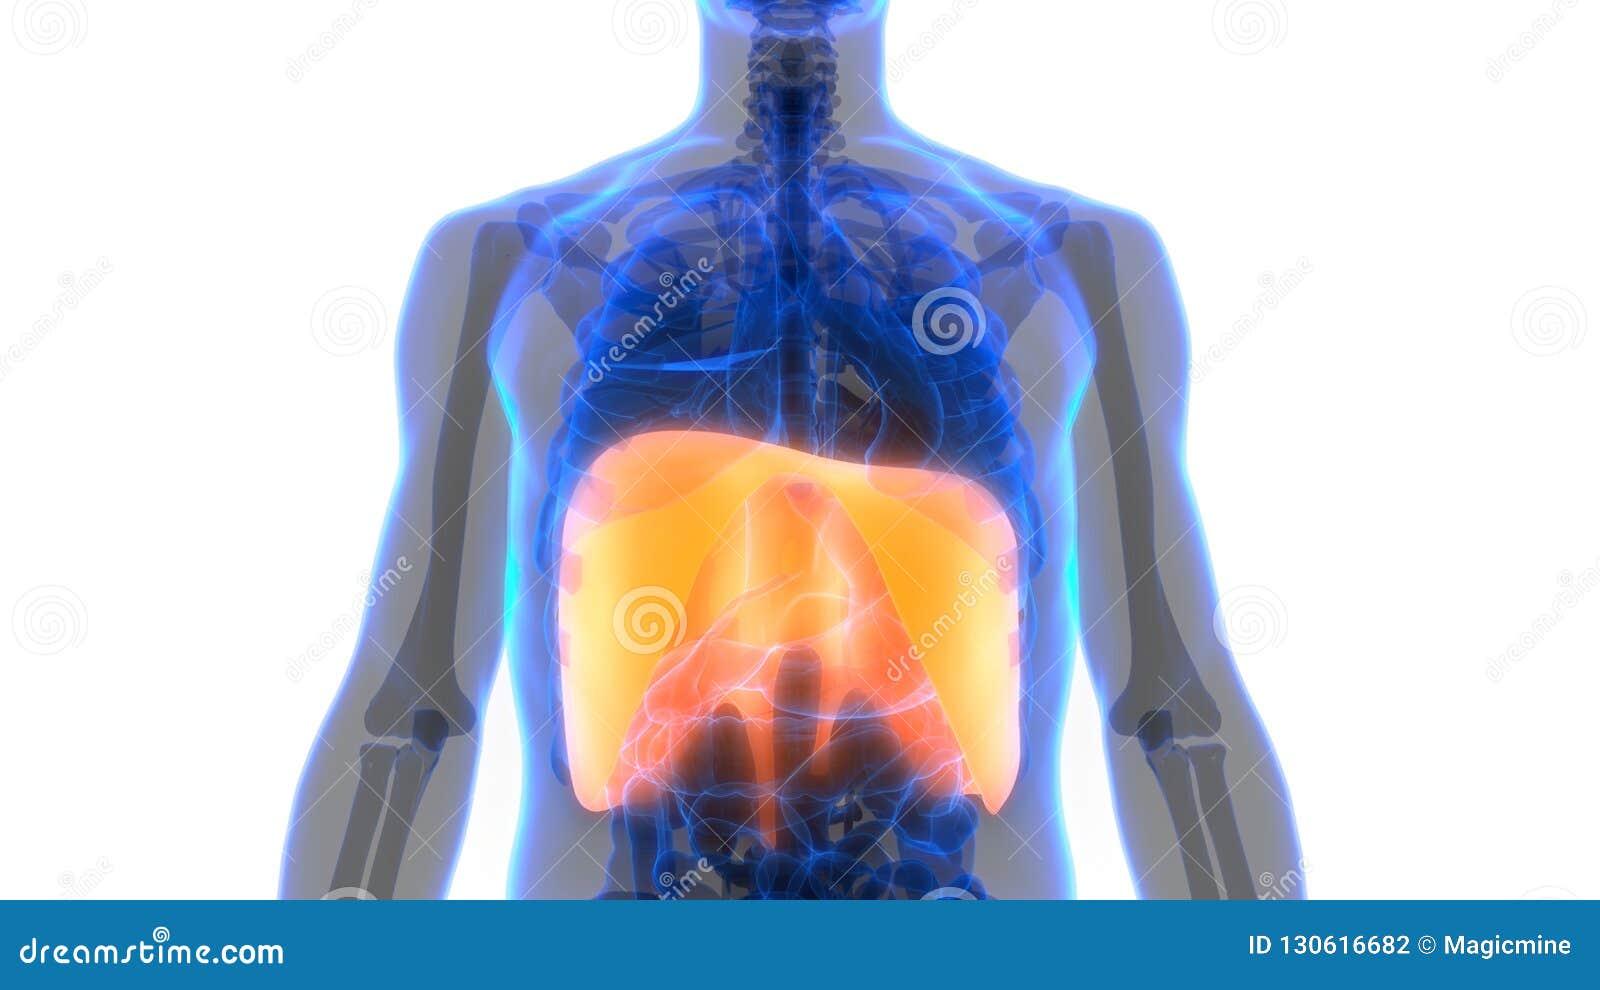 Human Body Organs Respiratory System Diaphragm Anatomy Stock